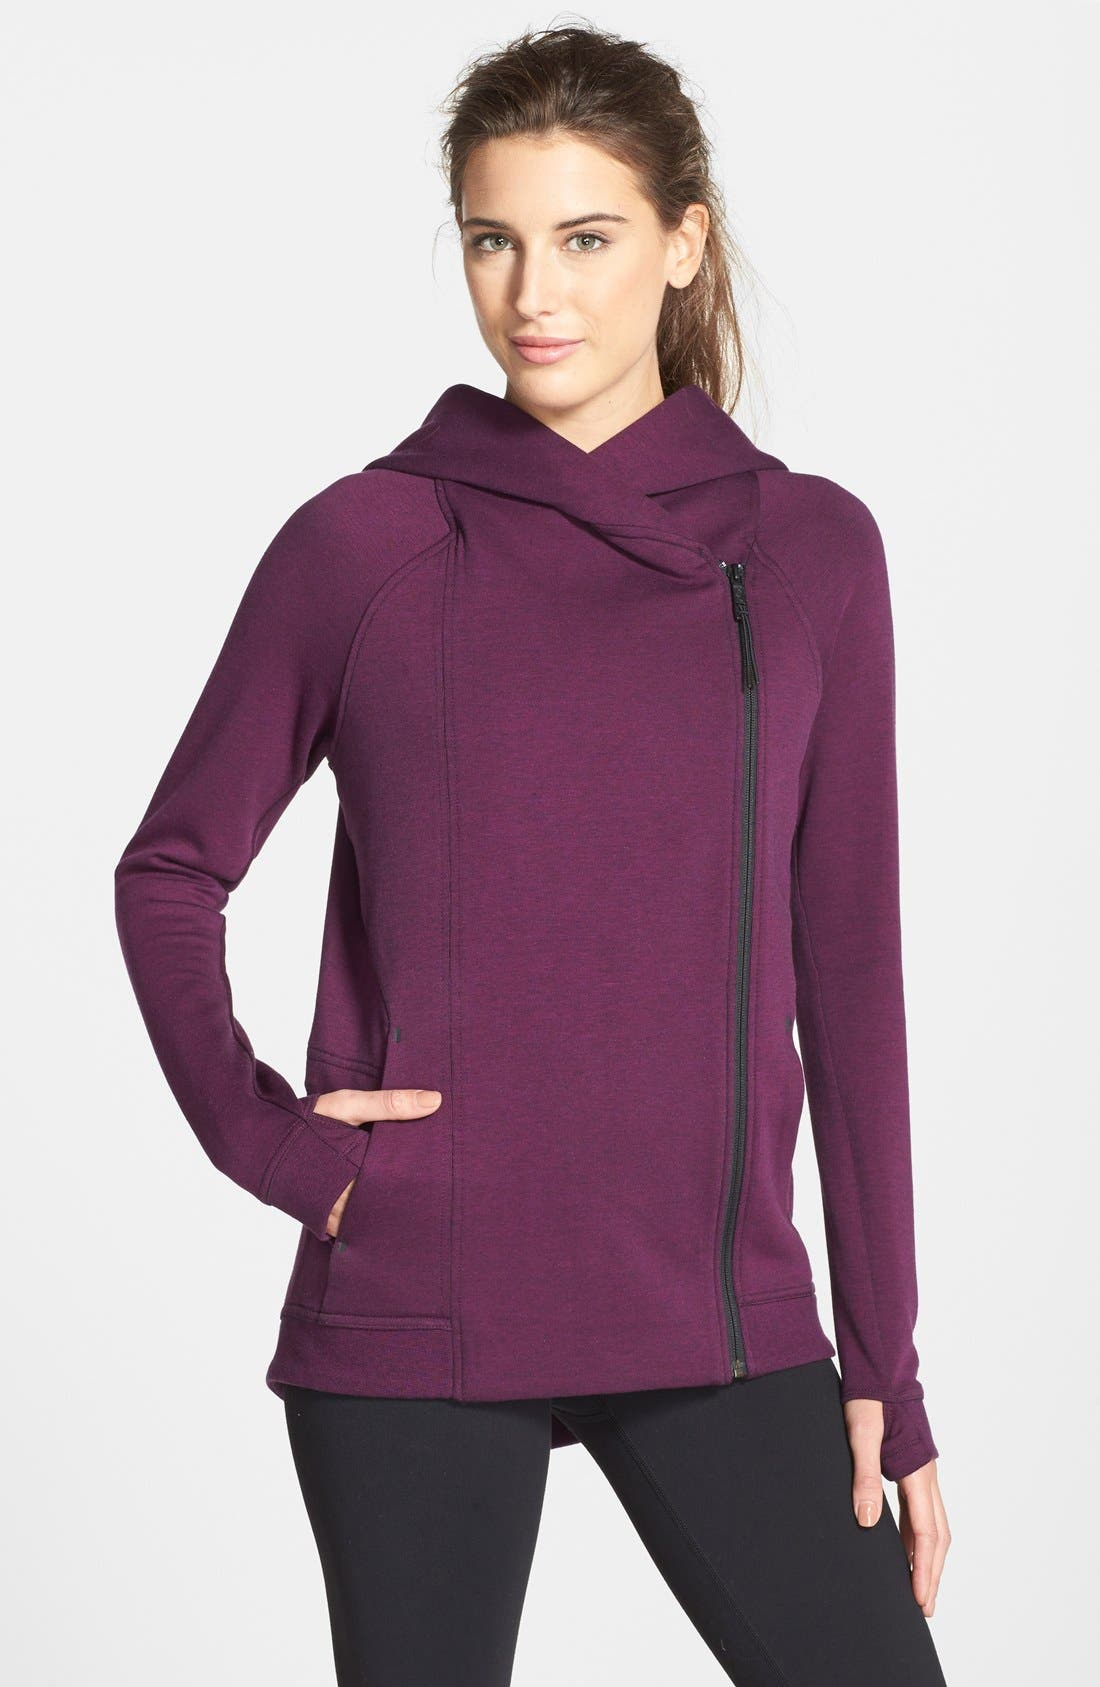 Main Image - Nike Tech Fleece Cape Jacket